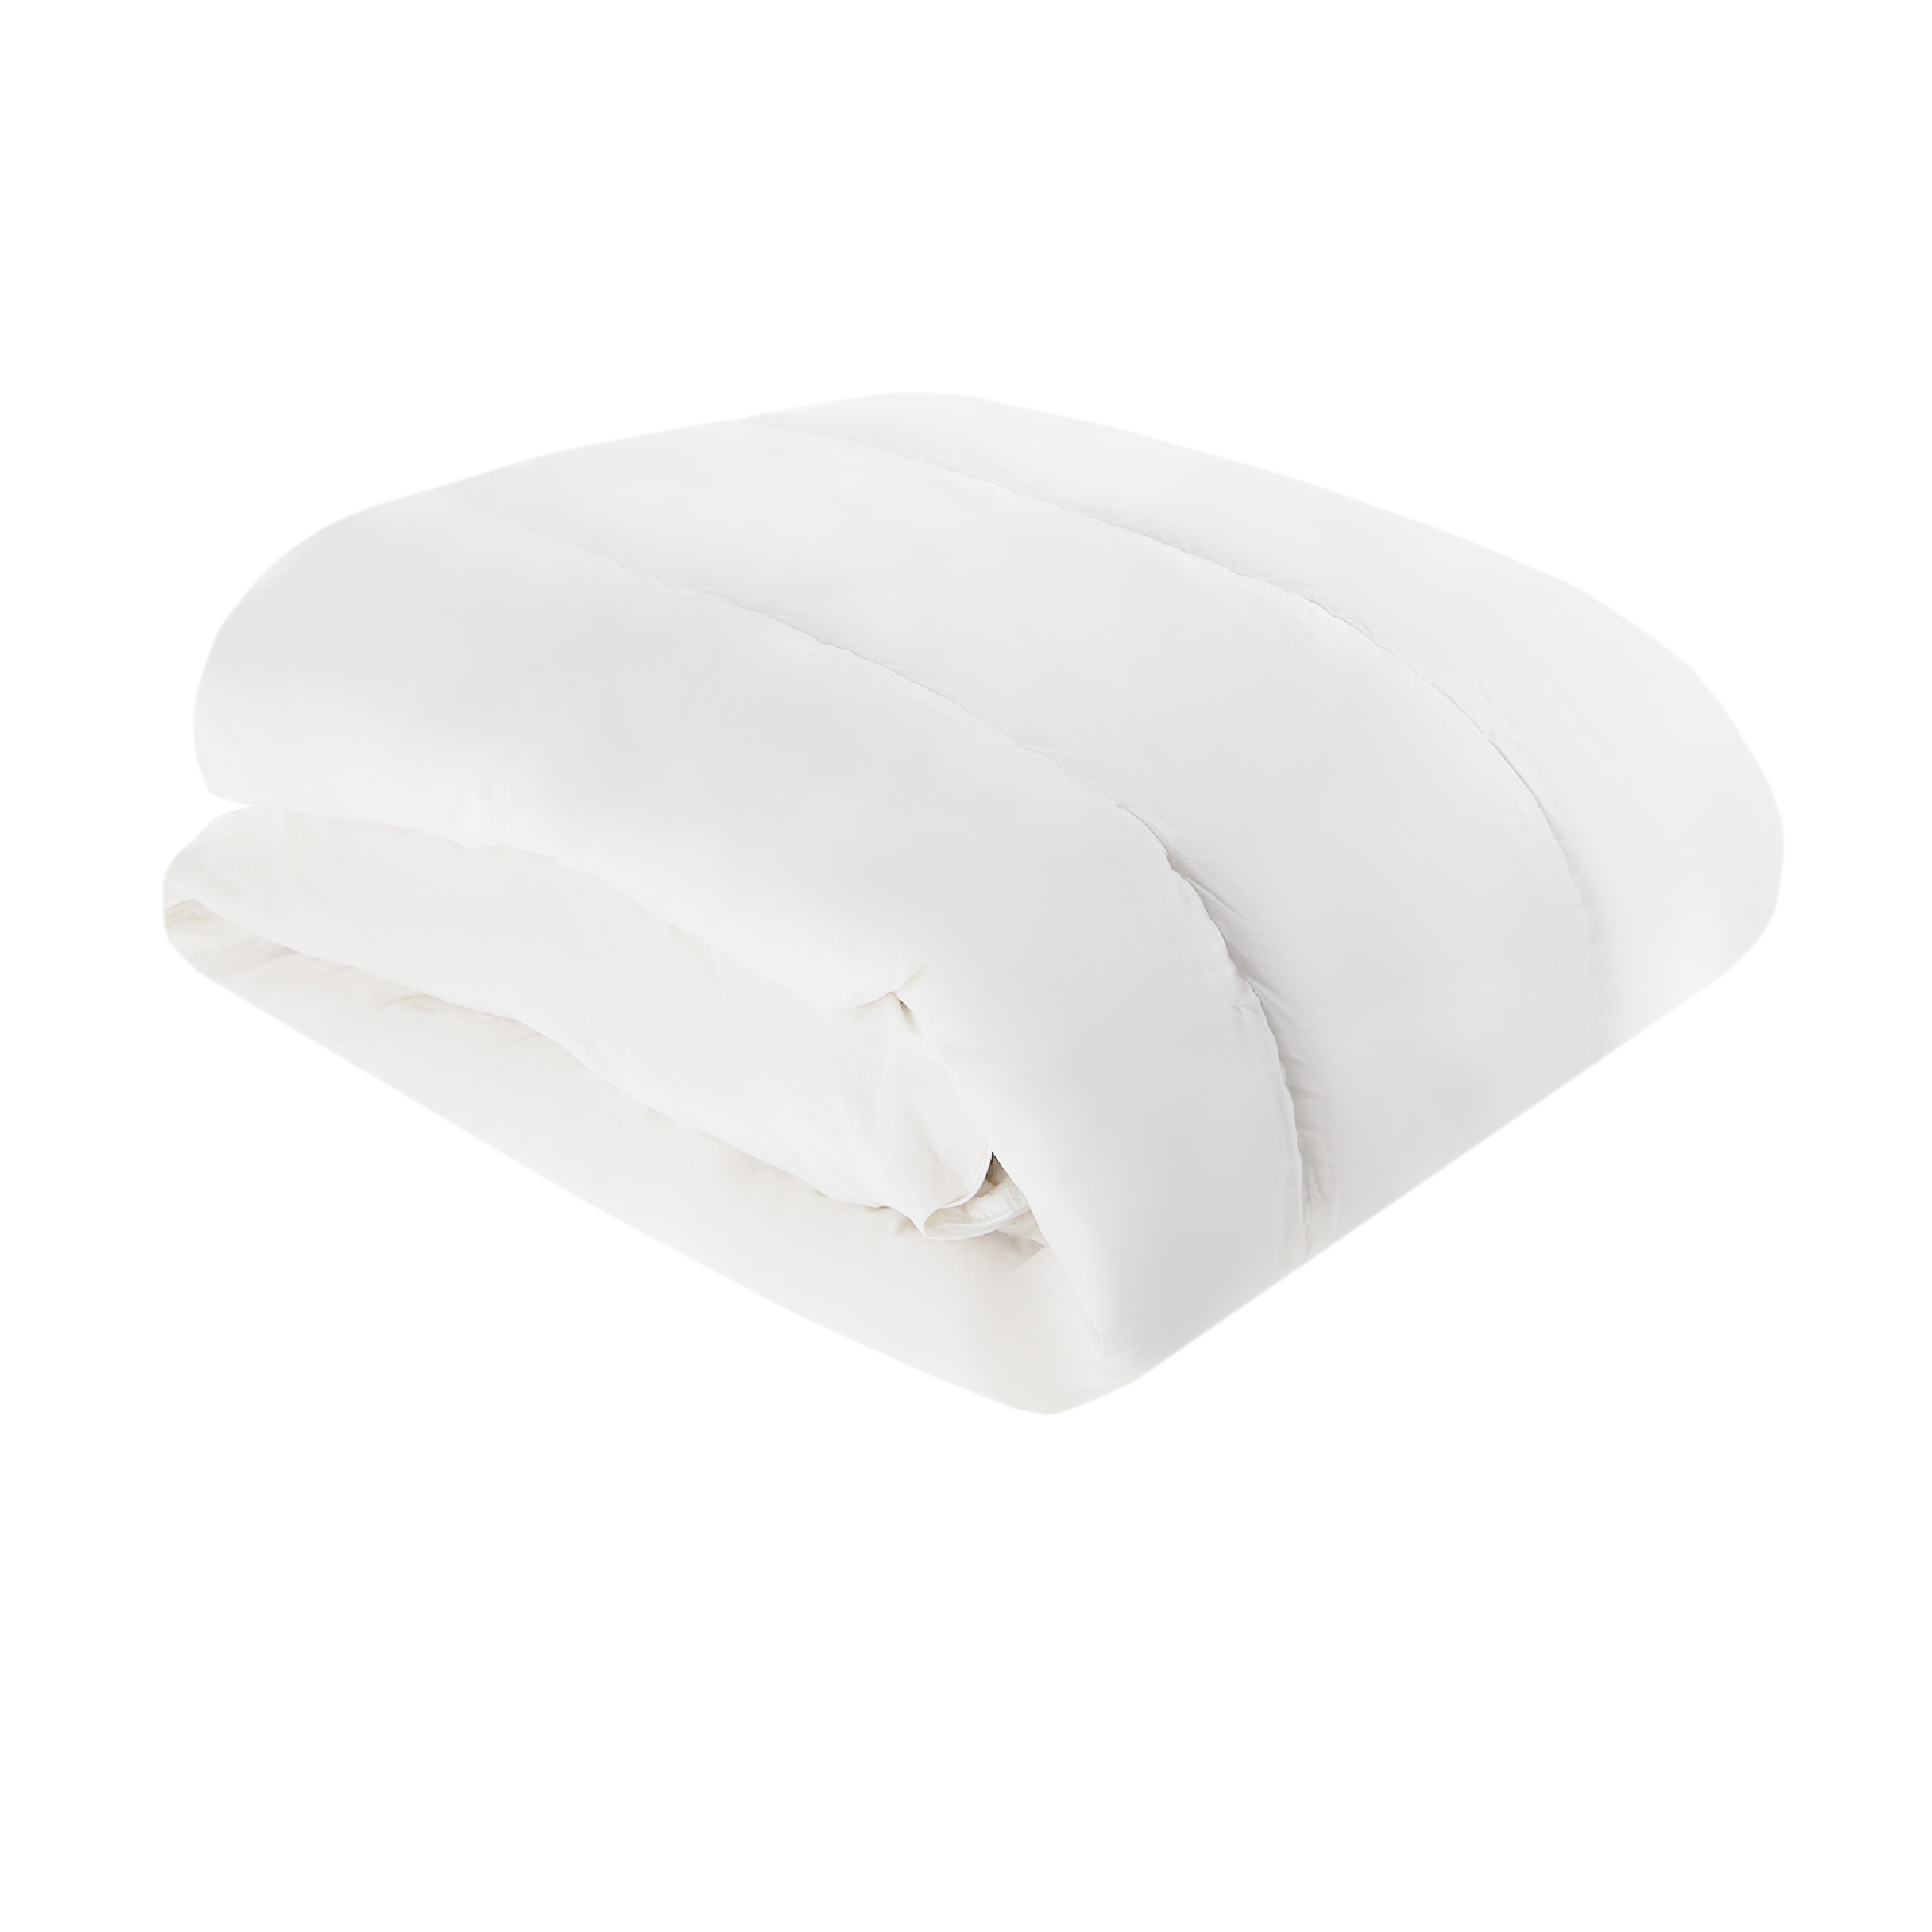 Купить со скидкой Одеяло пуховое Dykon Ugly duckling 140х200 см